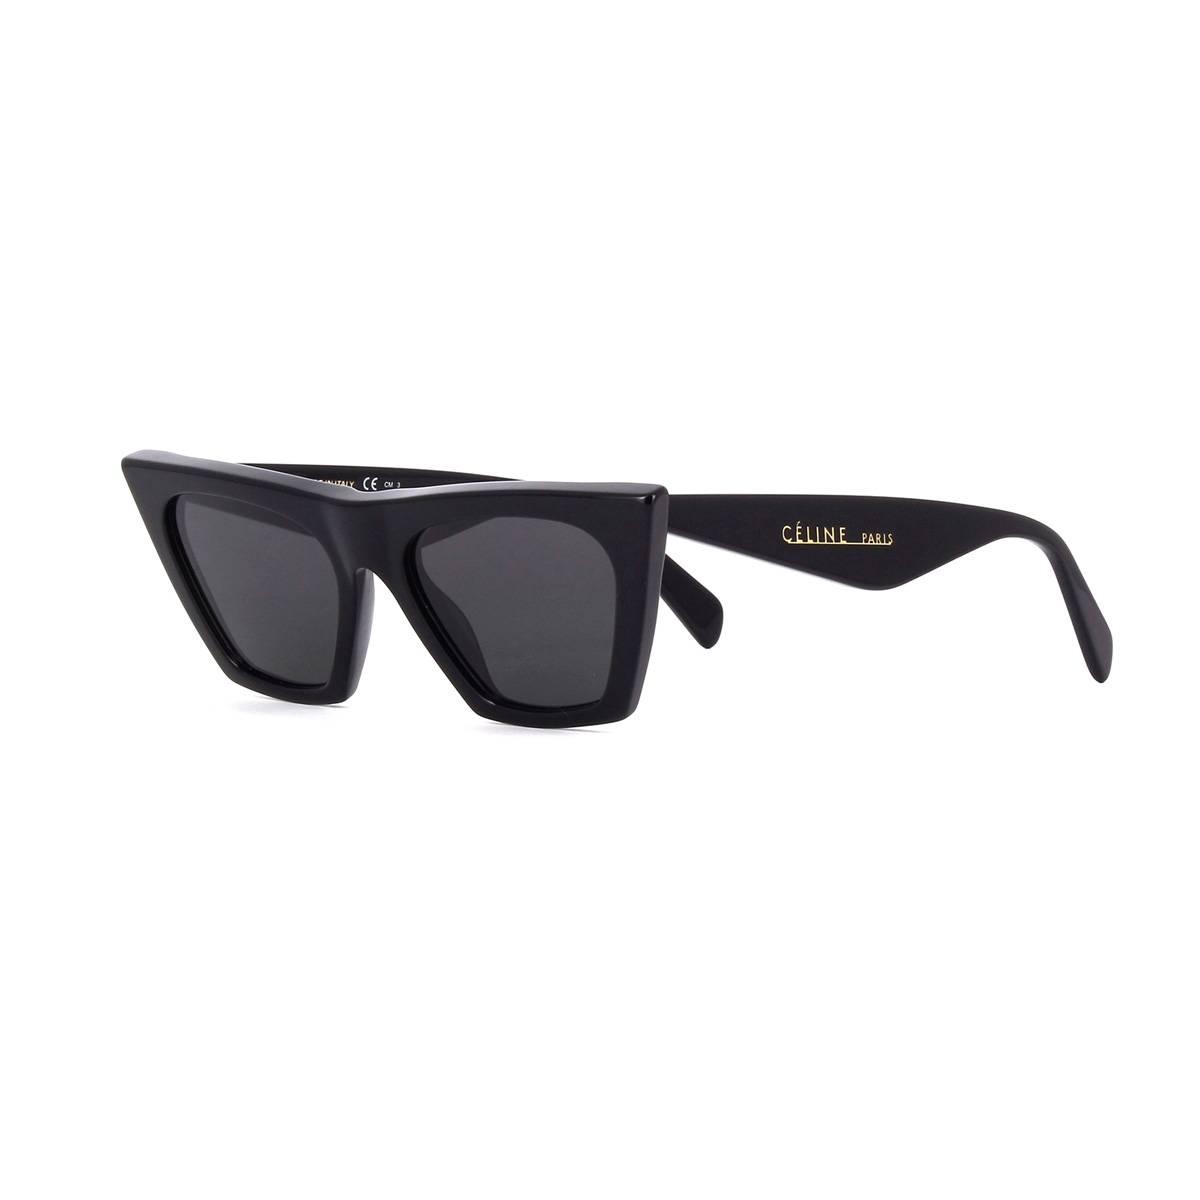 Celine sunglasses -